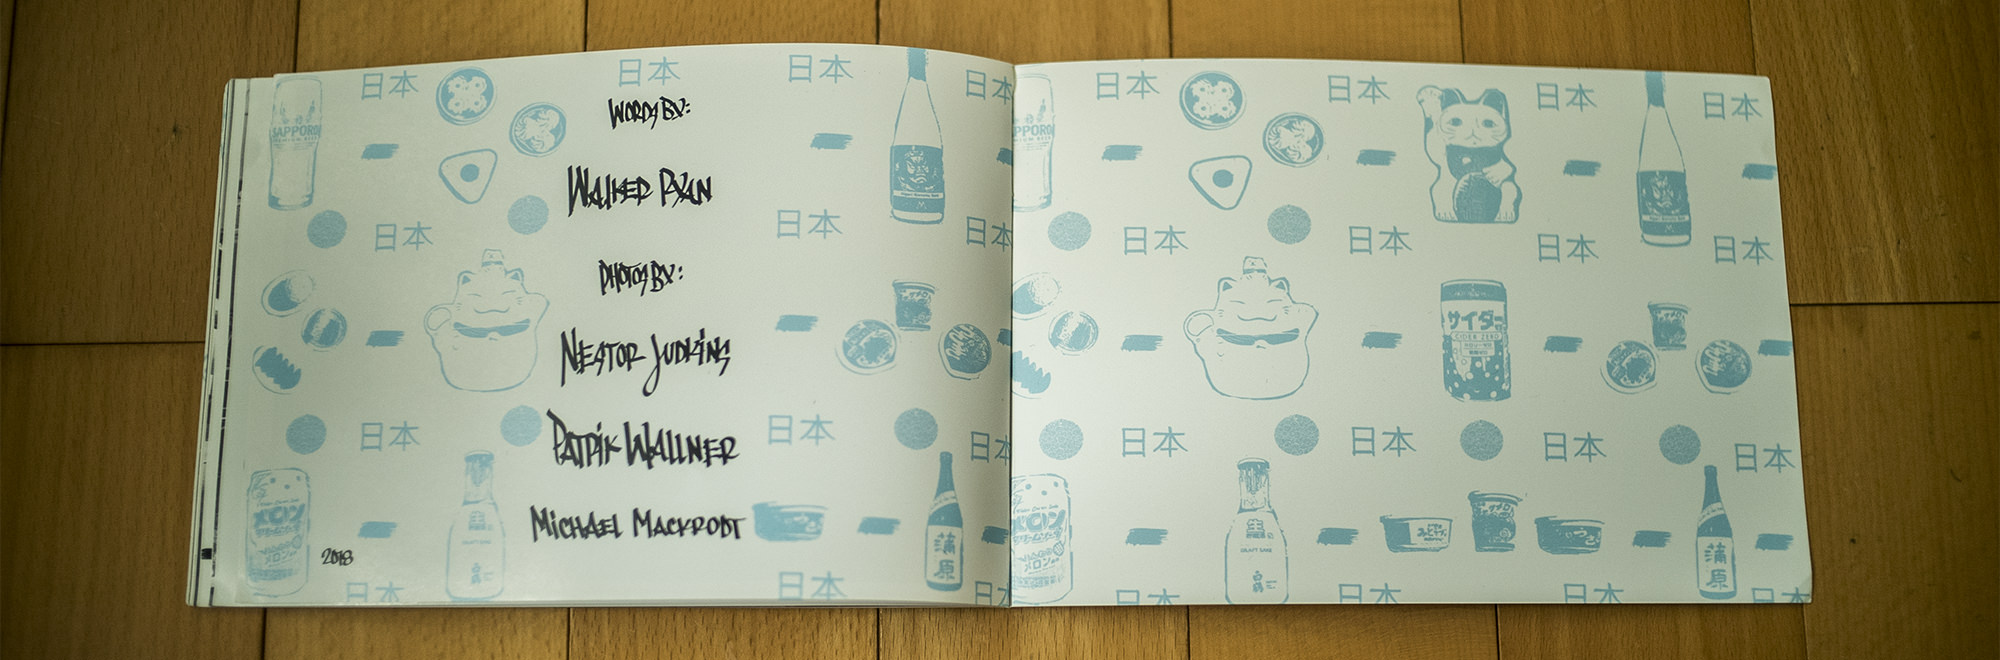 Old Friend Japan Page 19 LOWQ